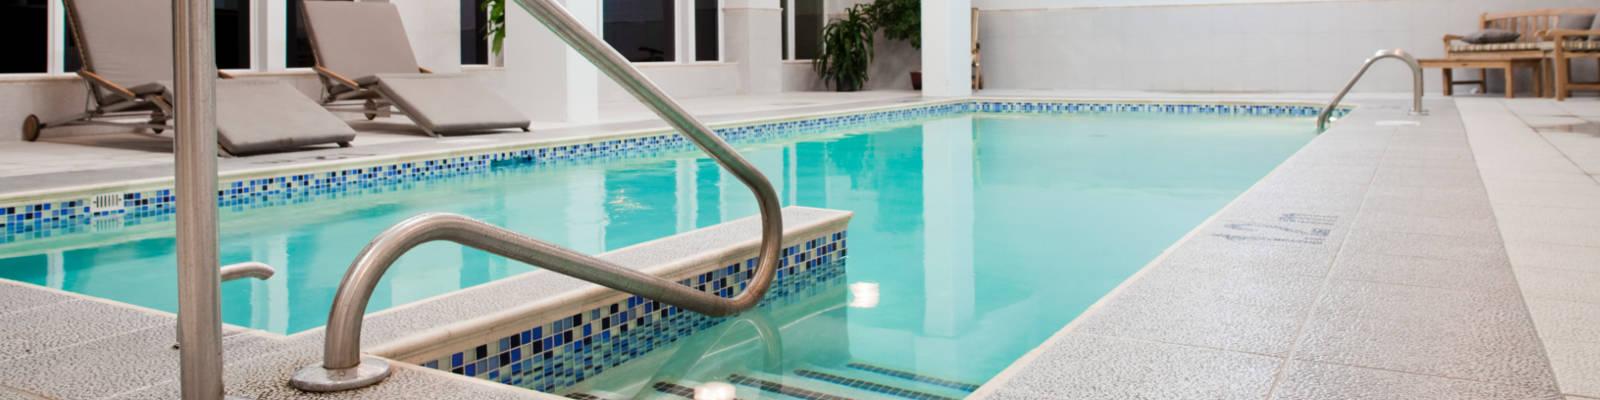 Neuer Indoor Pool im Keller